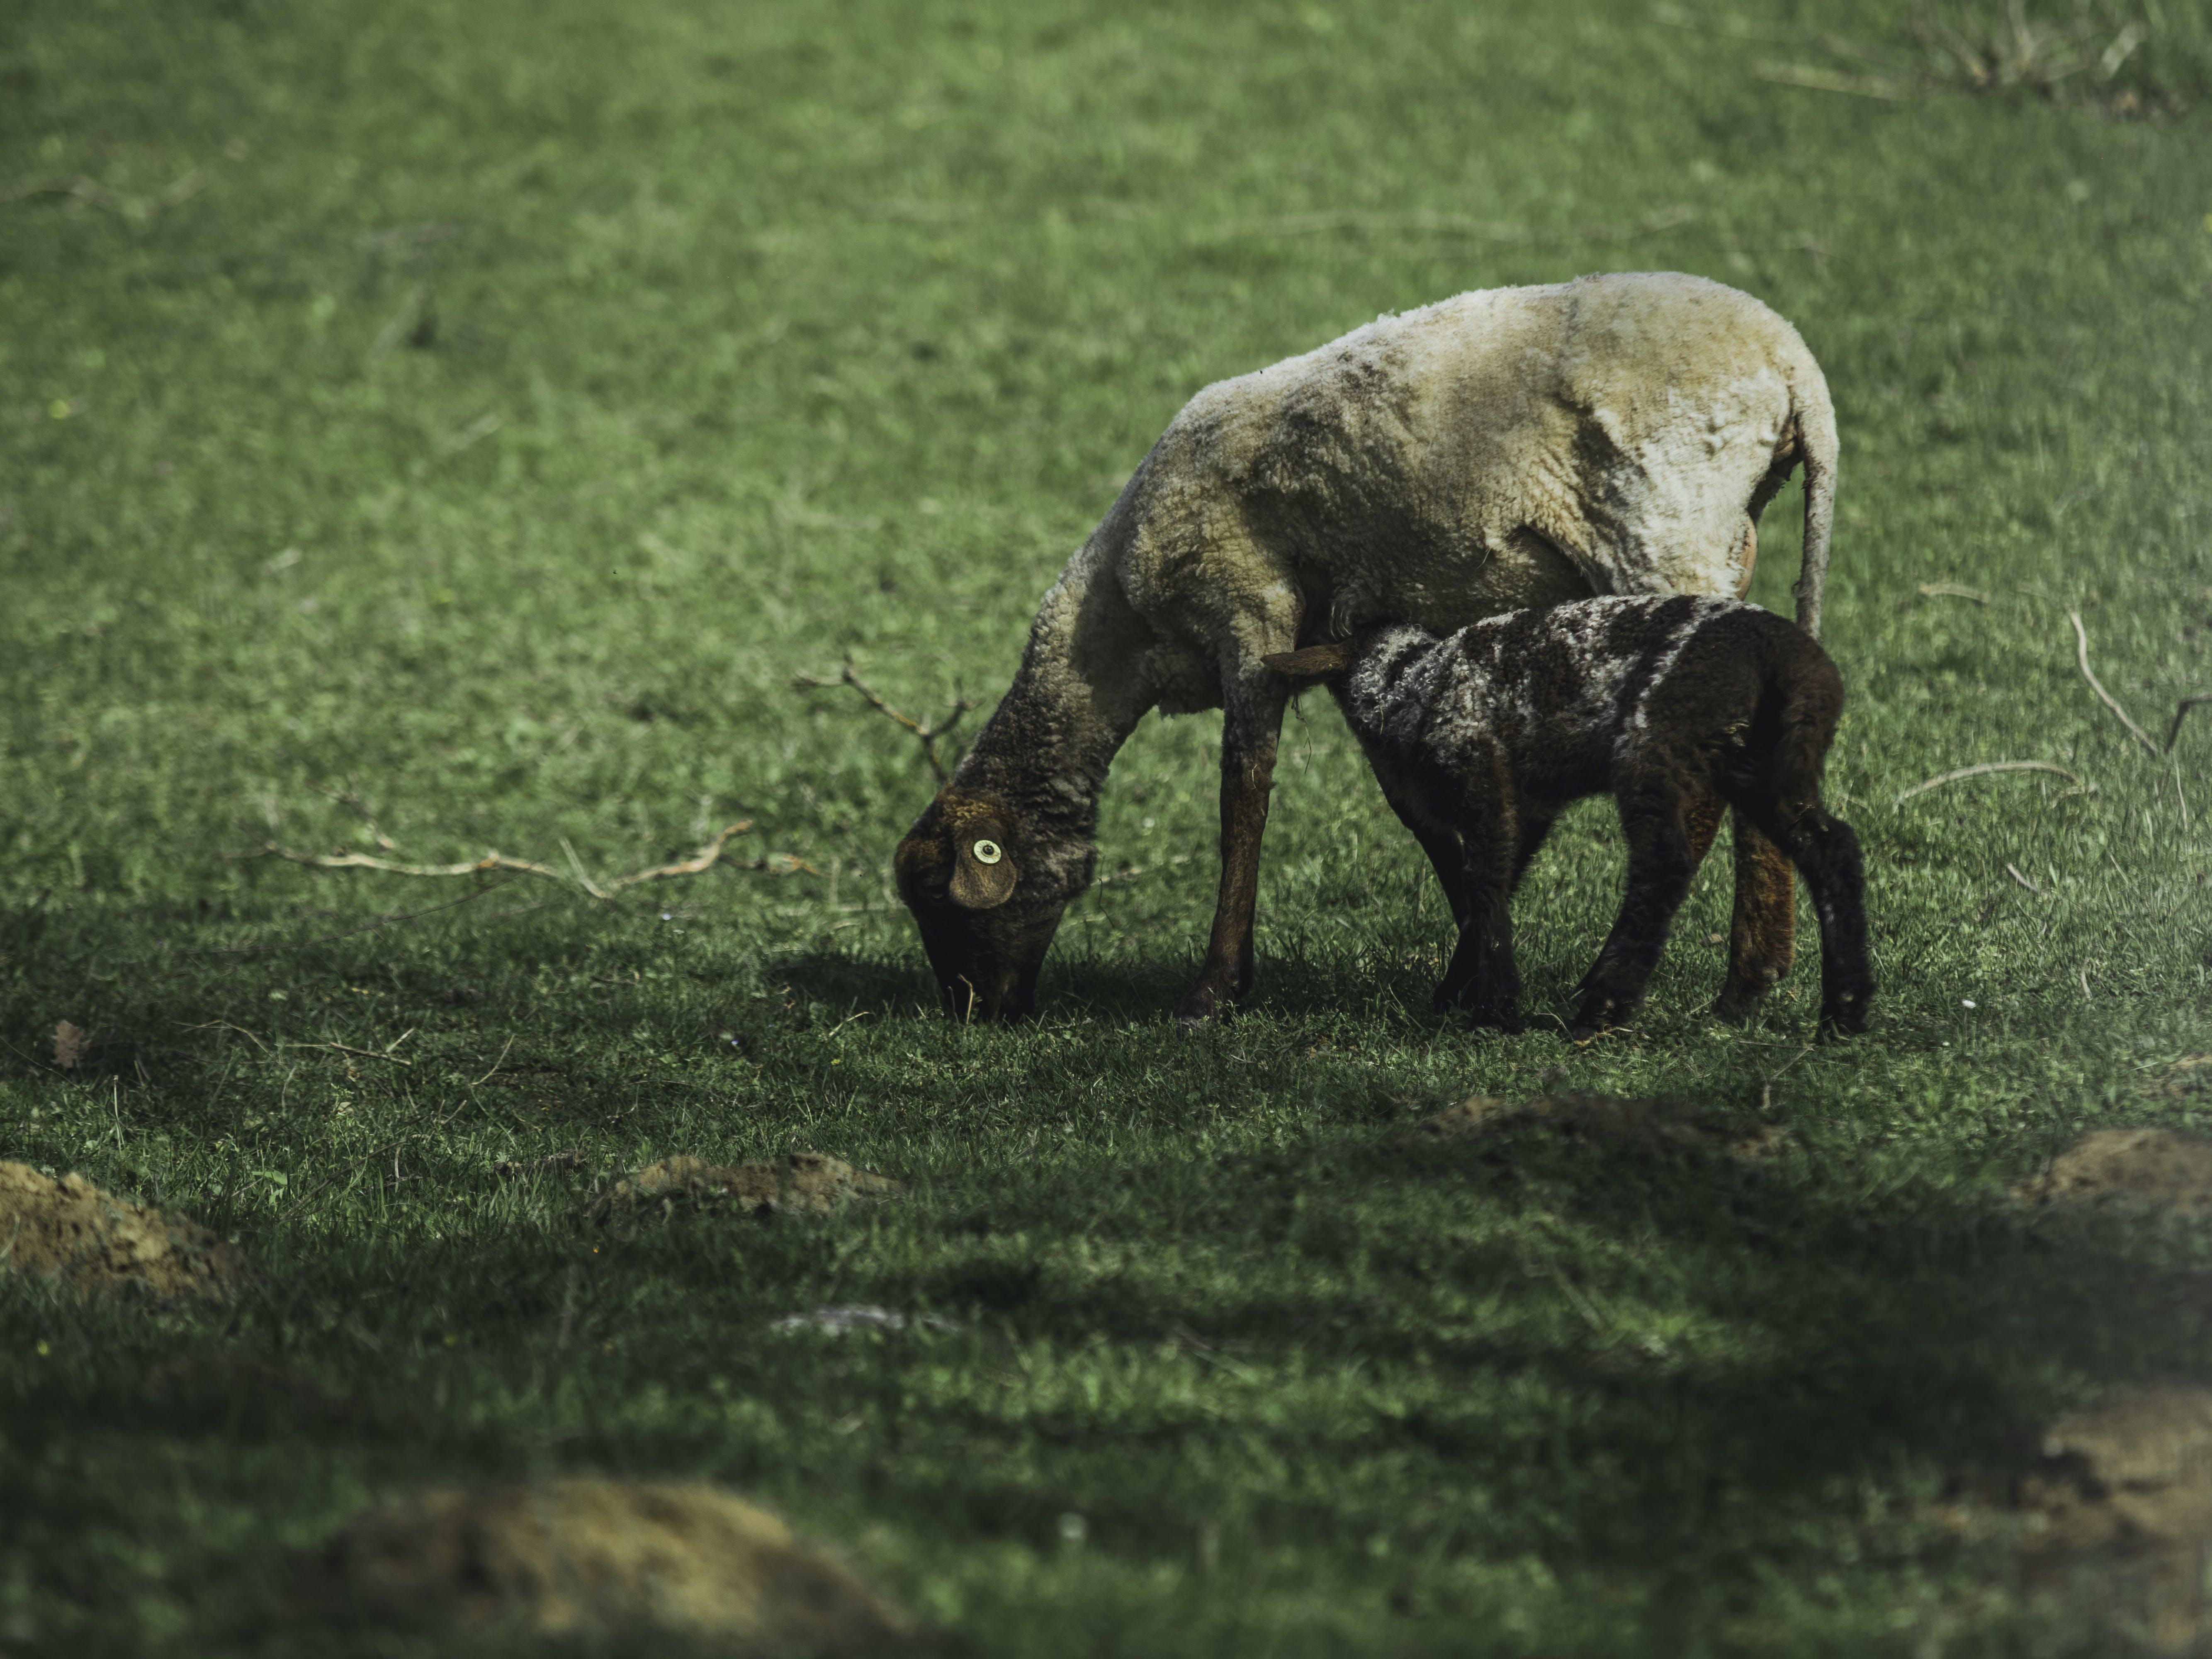 Fotos de stock gratuitas de animal, campo, césped, fauna